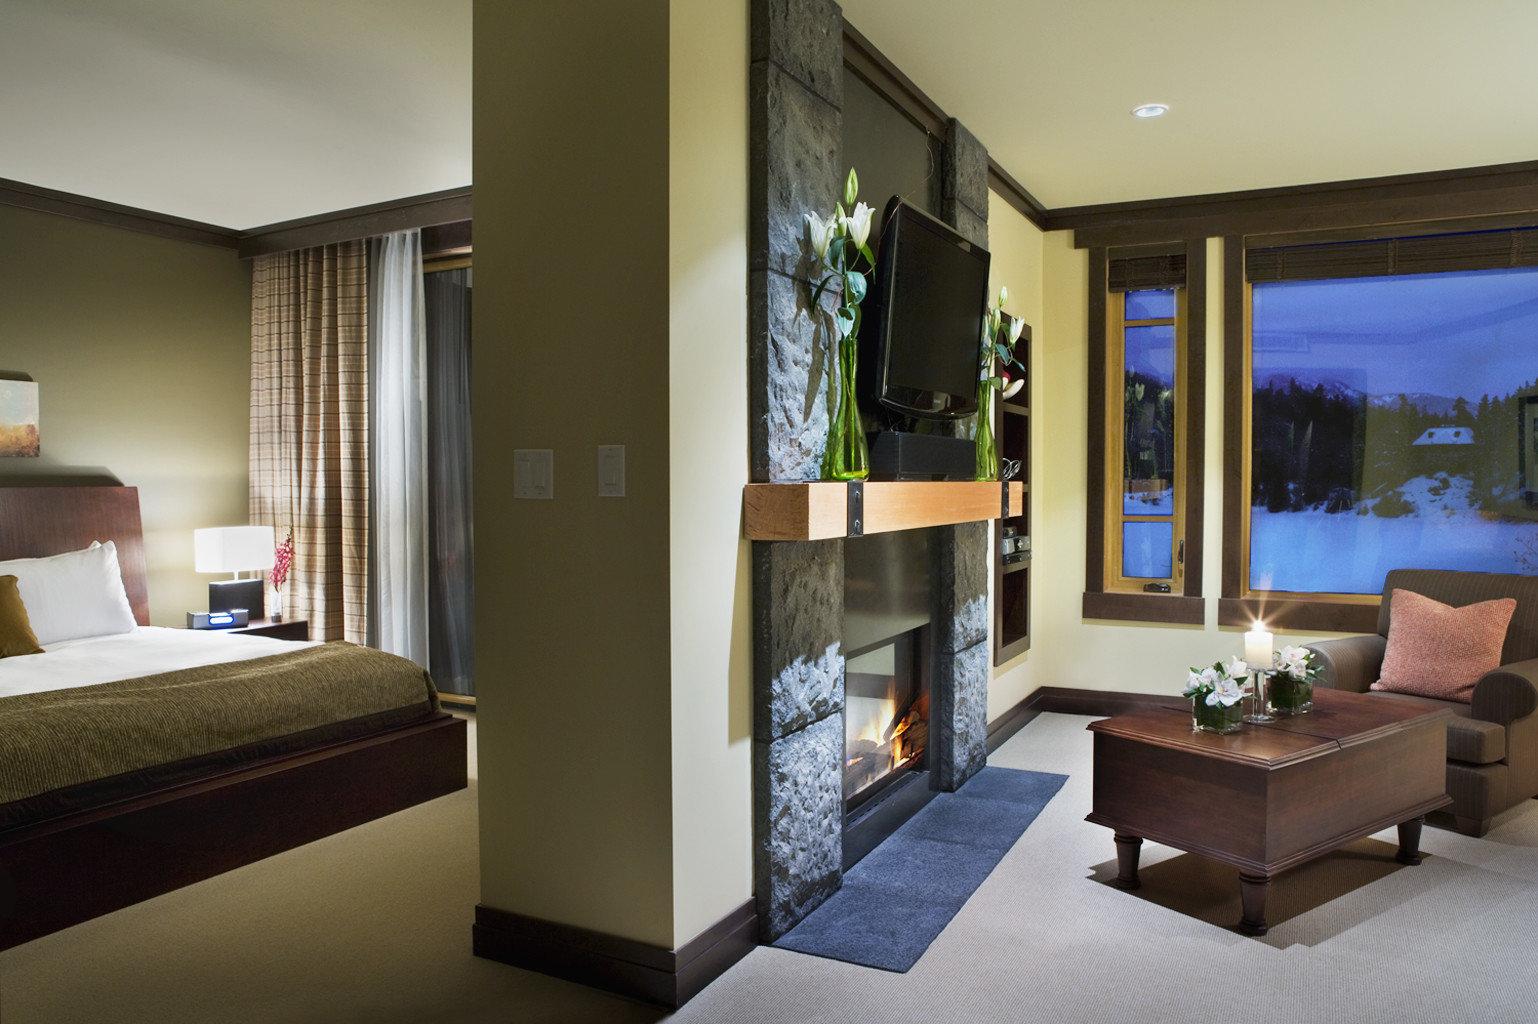 Bedroom Fireplace Lodge Luxury Mountains Romantic Scenic views Suite property condominium home living room Lobby Villa